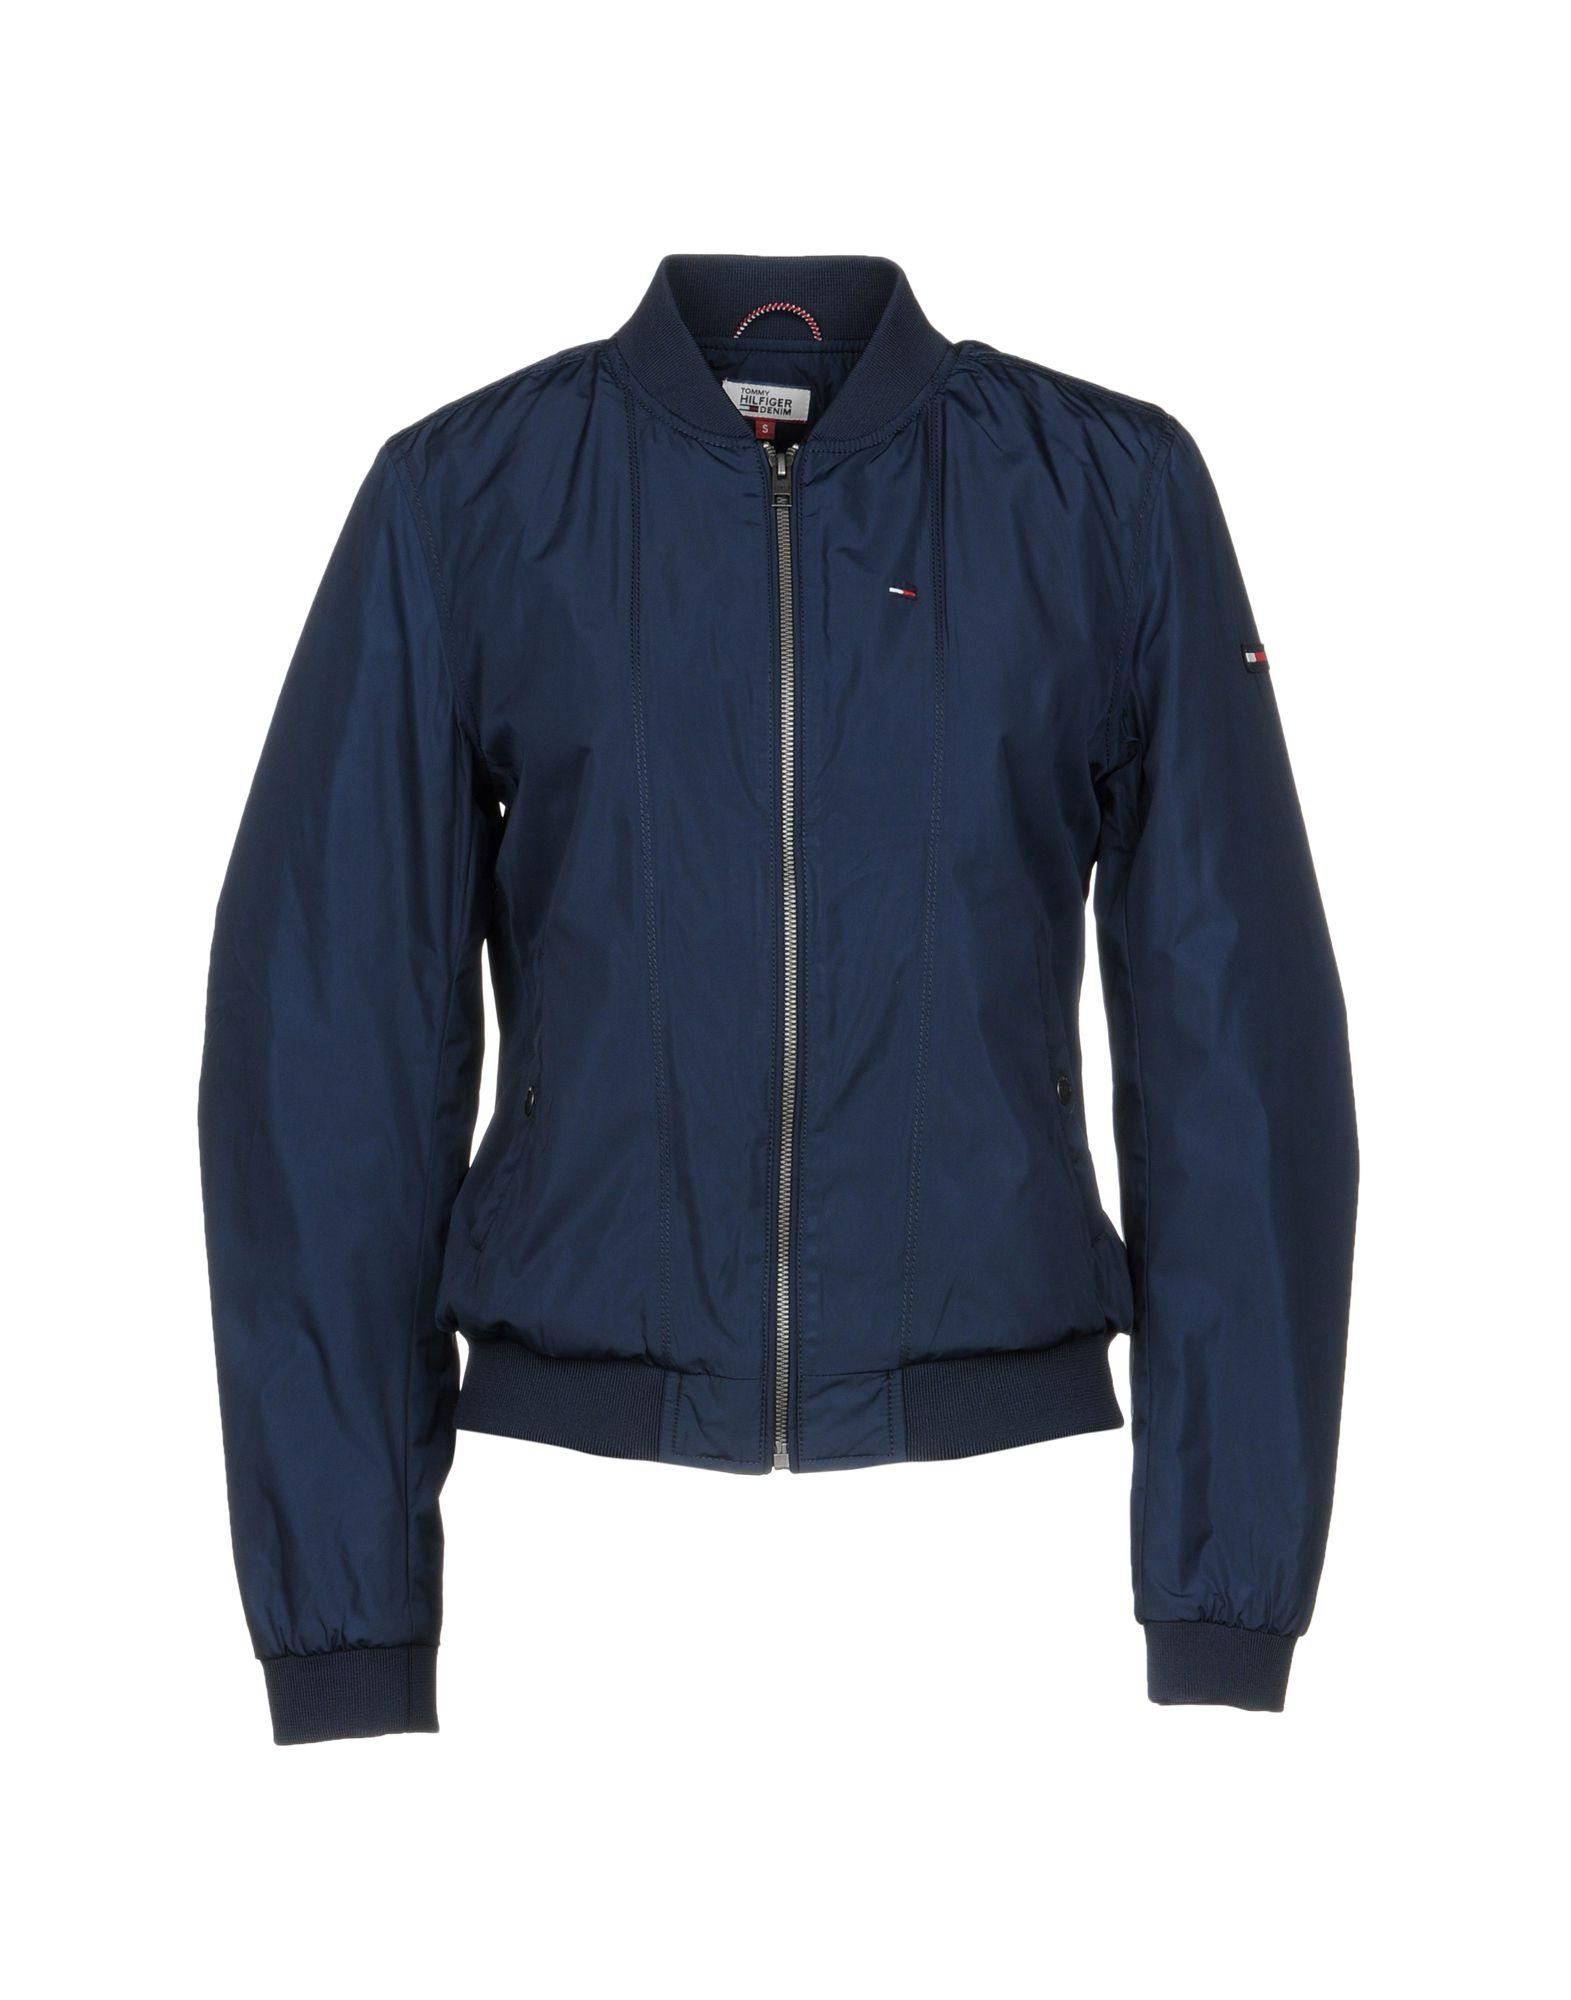 TOMMY HILFIGER DENIM Куртка куртка tommy hilfiger mw0mw02101 403 sky captain